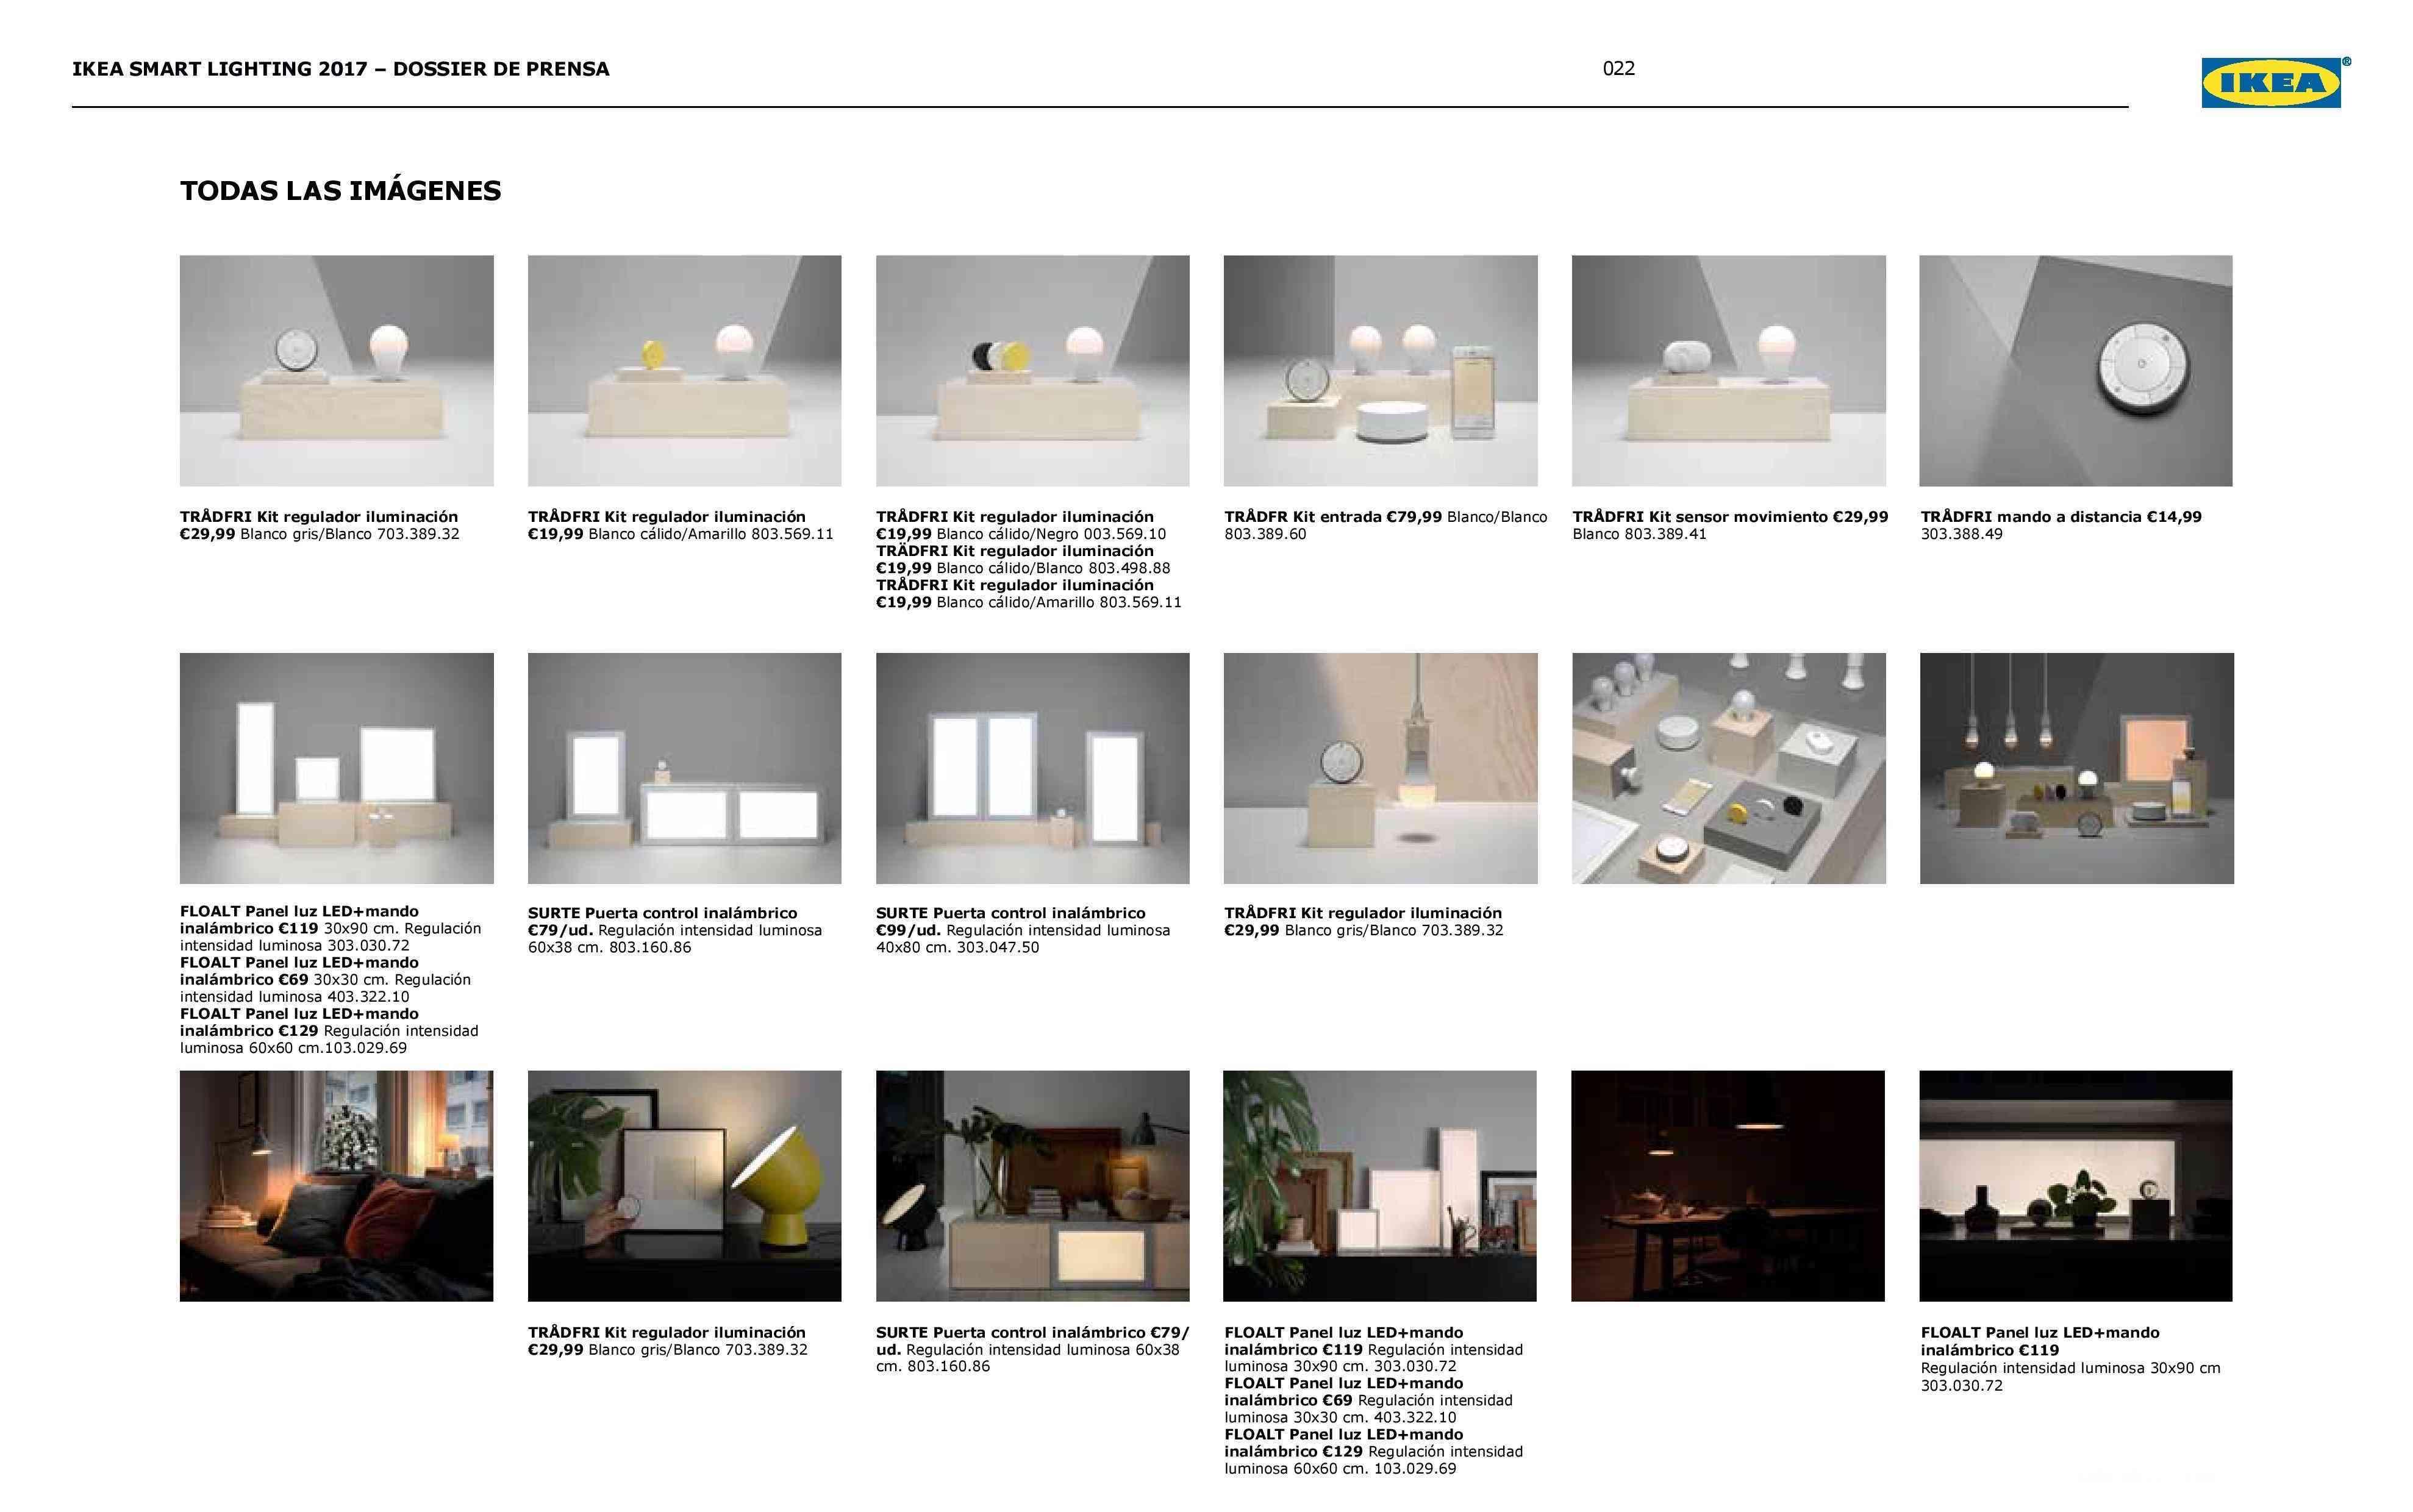 Novedades en iluminación de casas inteligentes con IKEA 78